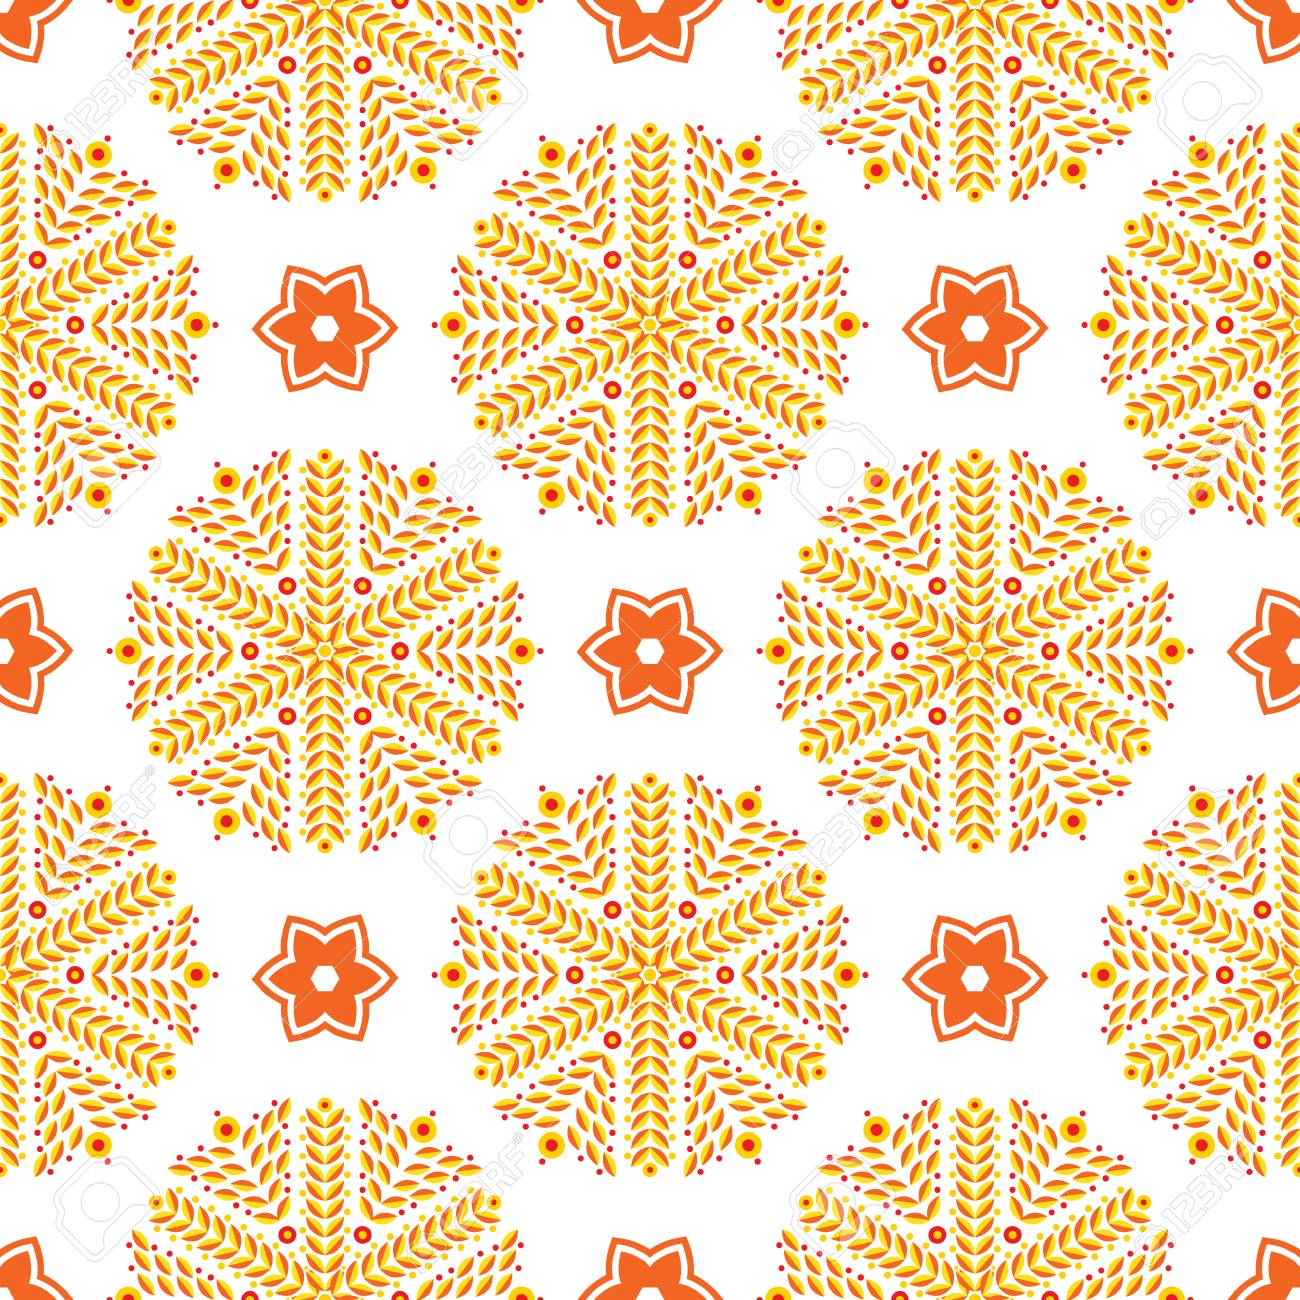 48322303 orange luxury background art deco for background wallpaper scrapbooking prints